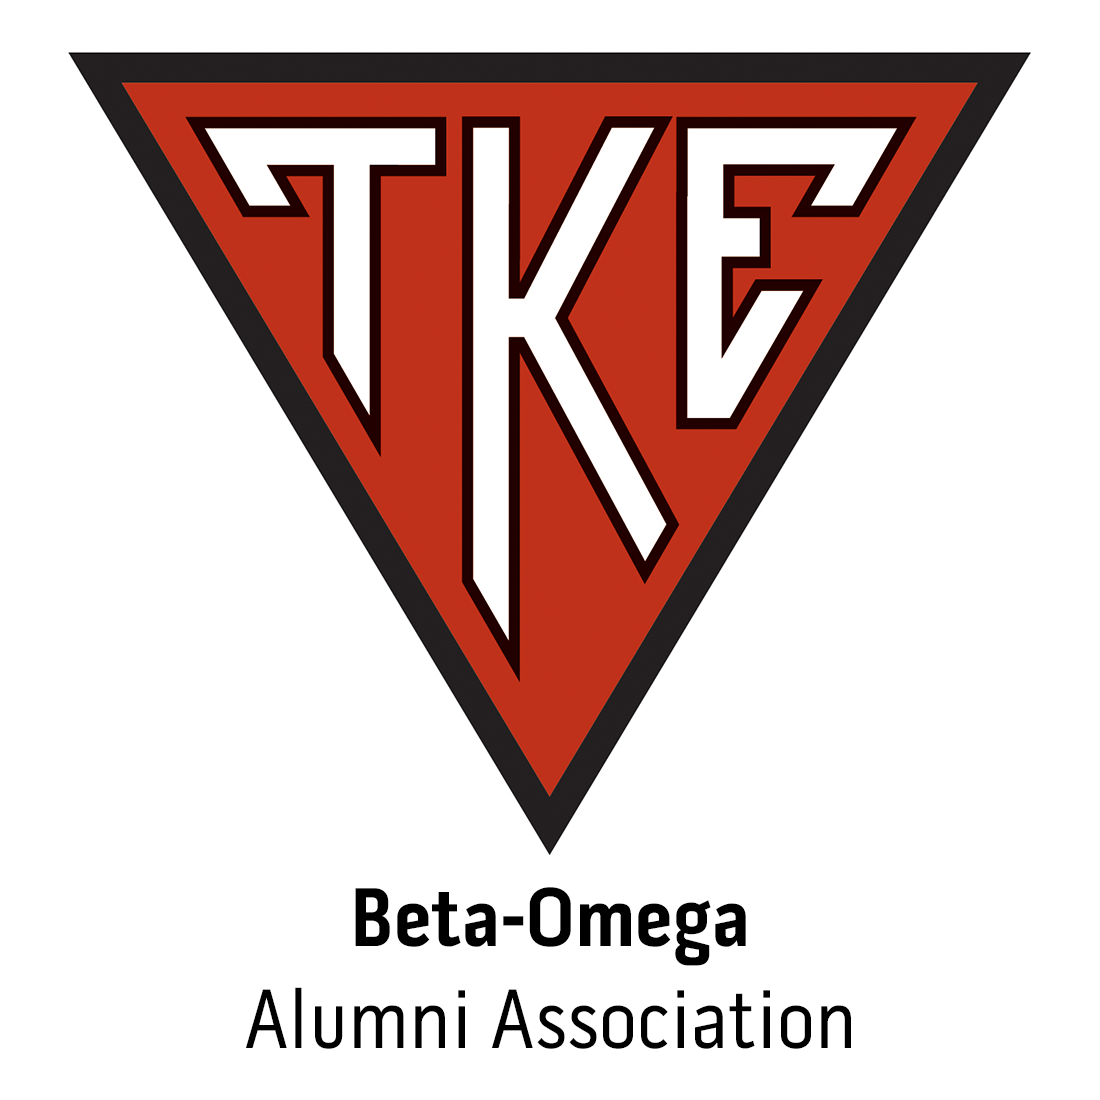 Beta-Omega Alumni Association at Missouri State University